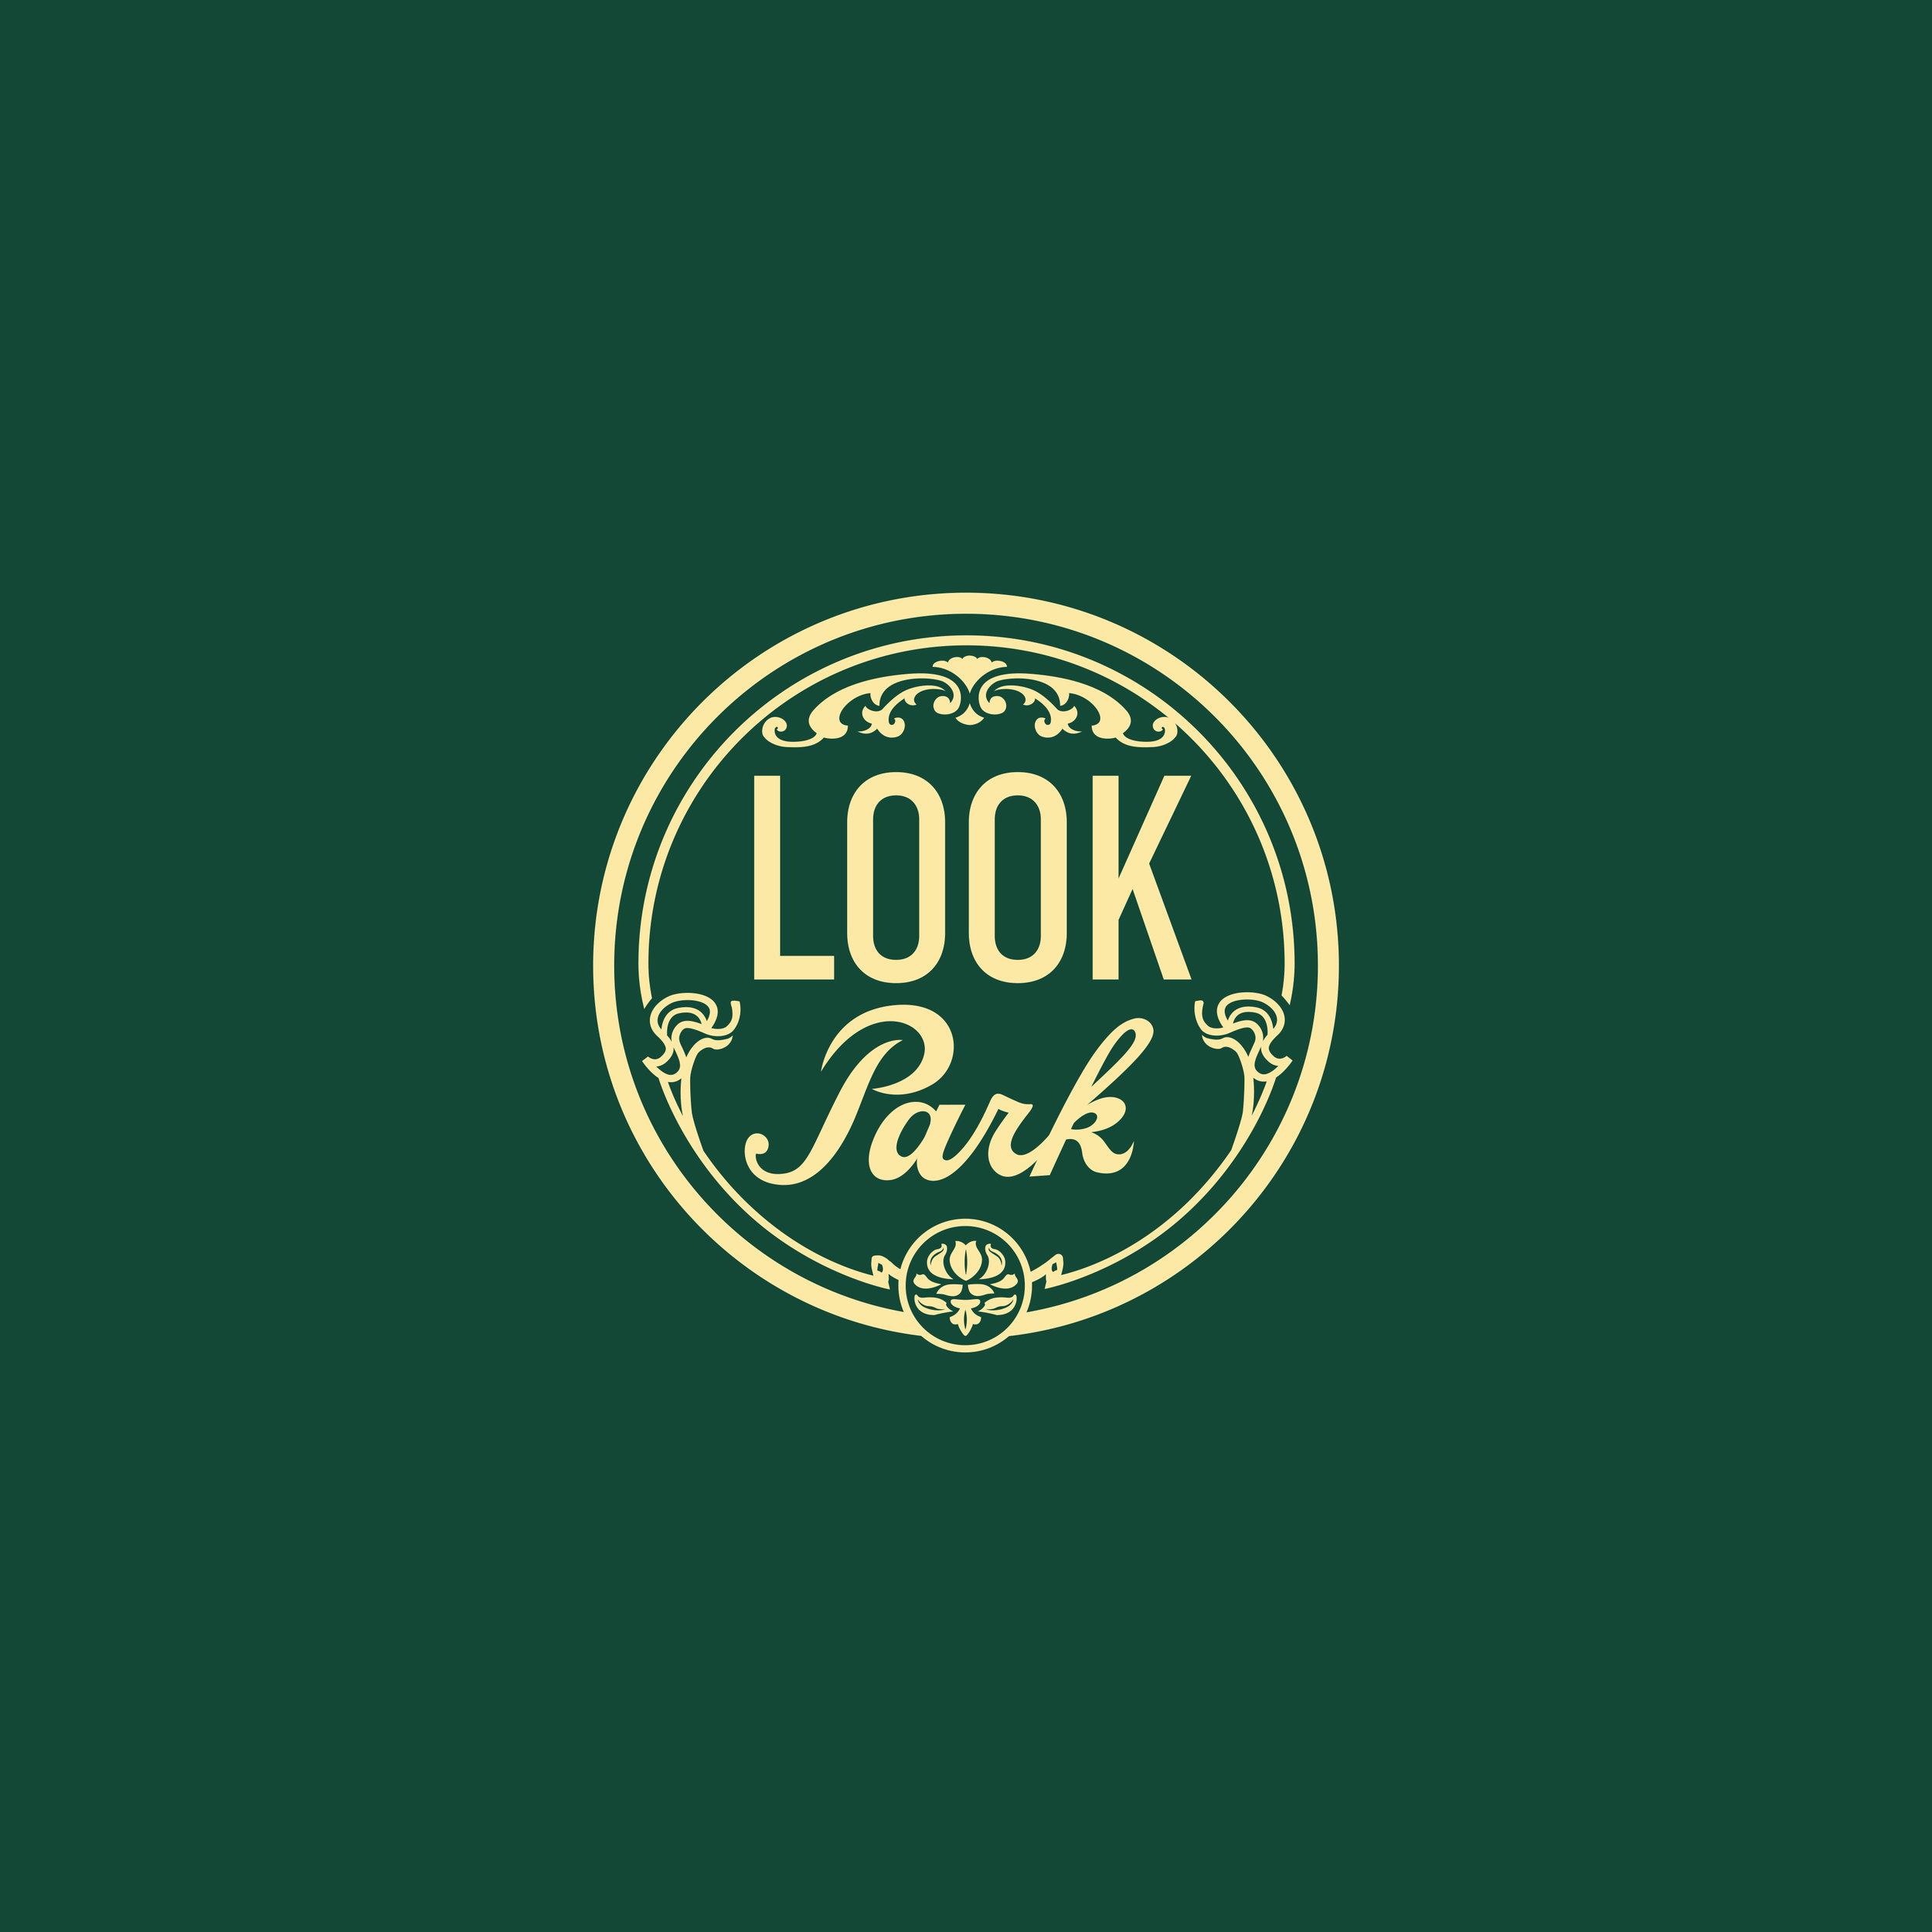 LookPark_CD_art_book_cover.jpg